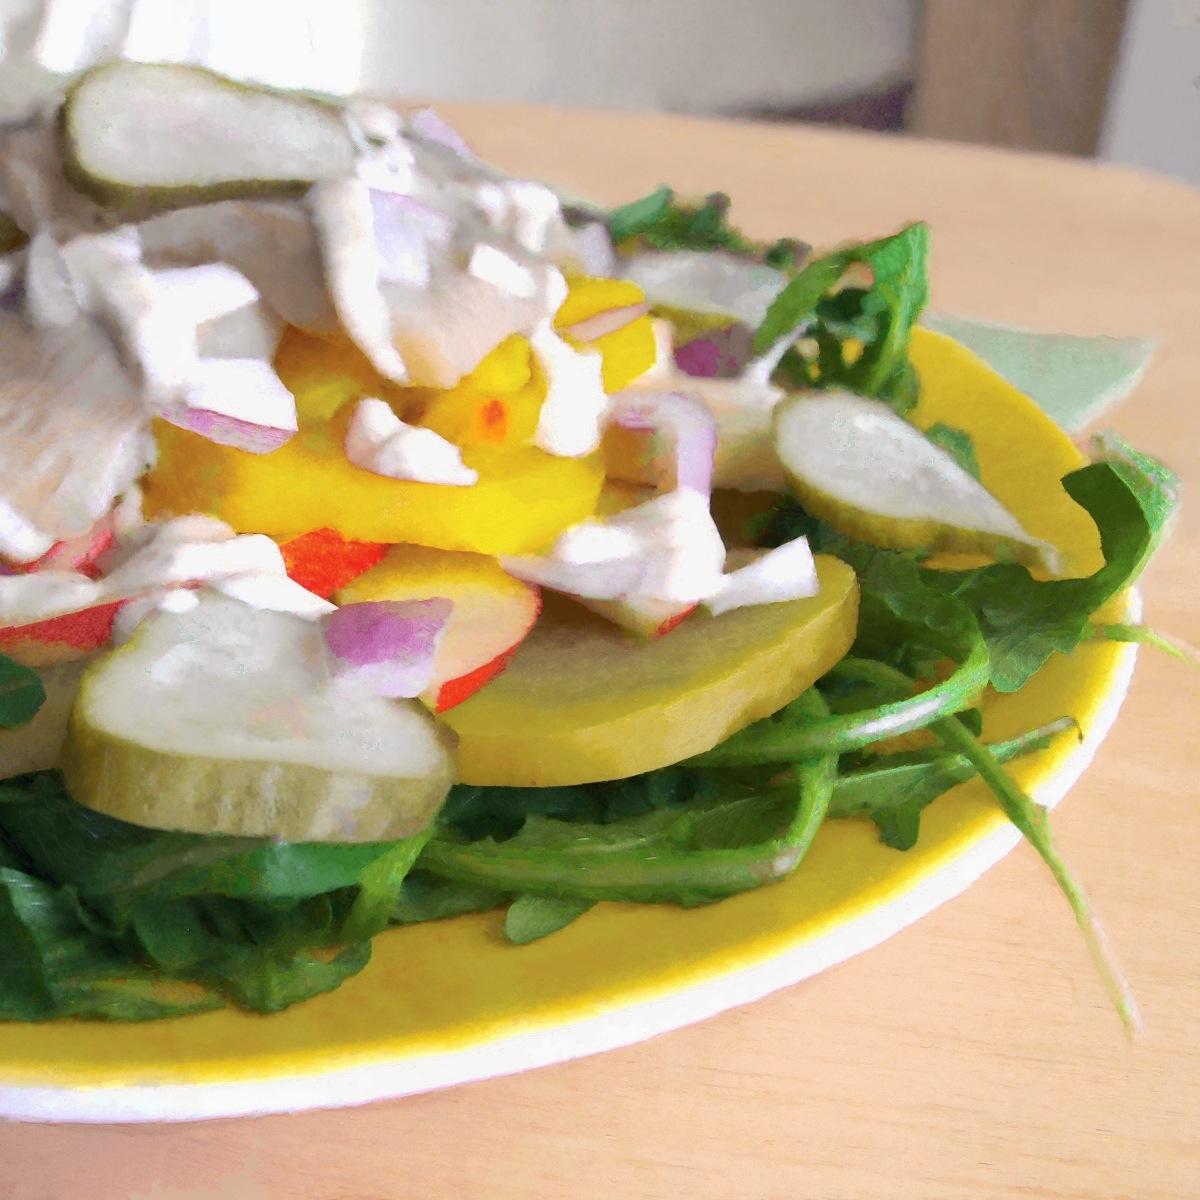 Herring, Apple, and Beet Salad with Horseradish-Sour Cream Dressing